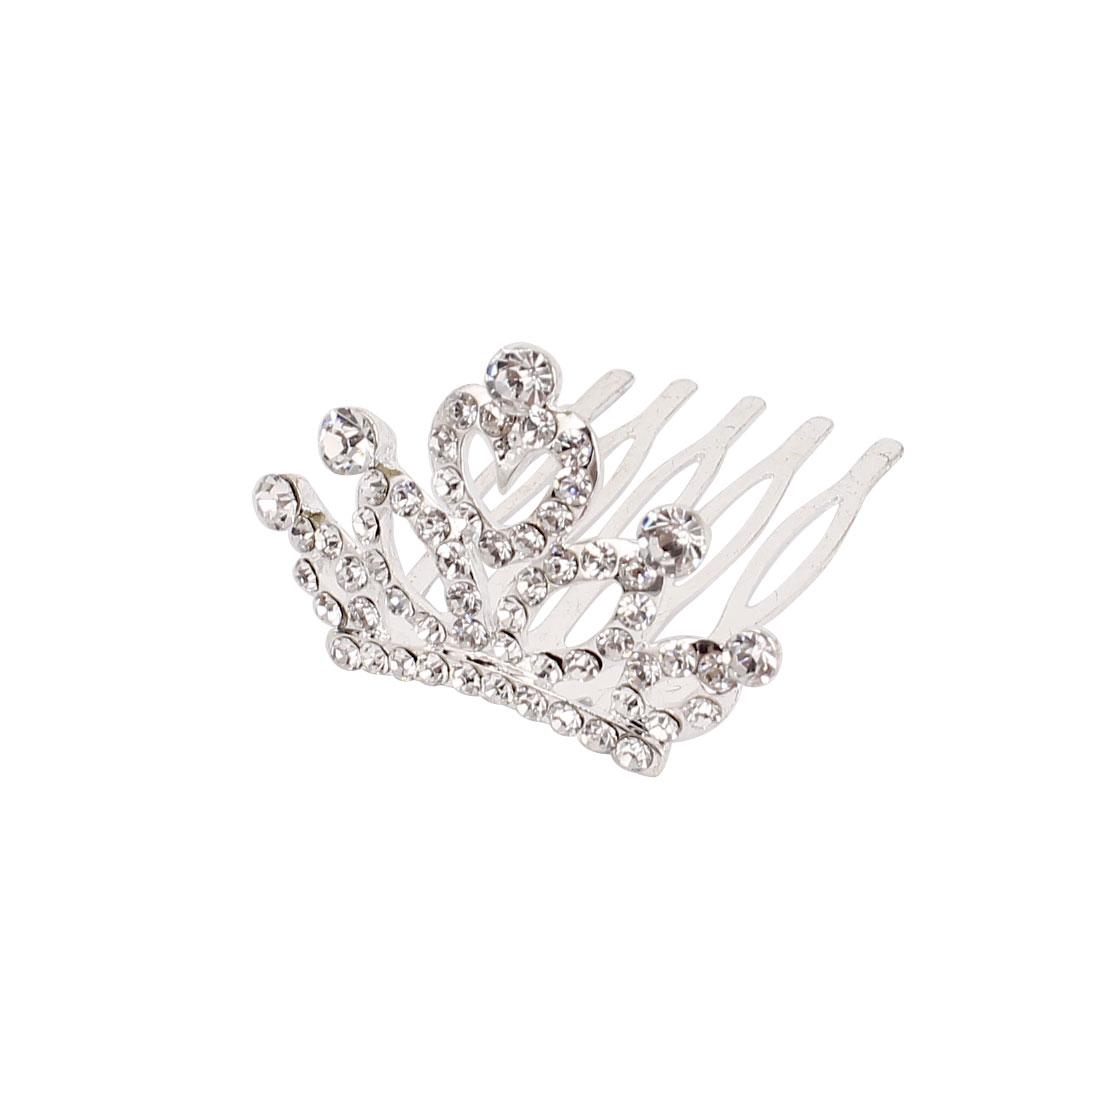 Party Wedding Crown Design Rhinestone Decor Hair Comb Slide Clip Silver Tone